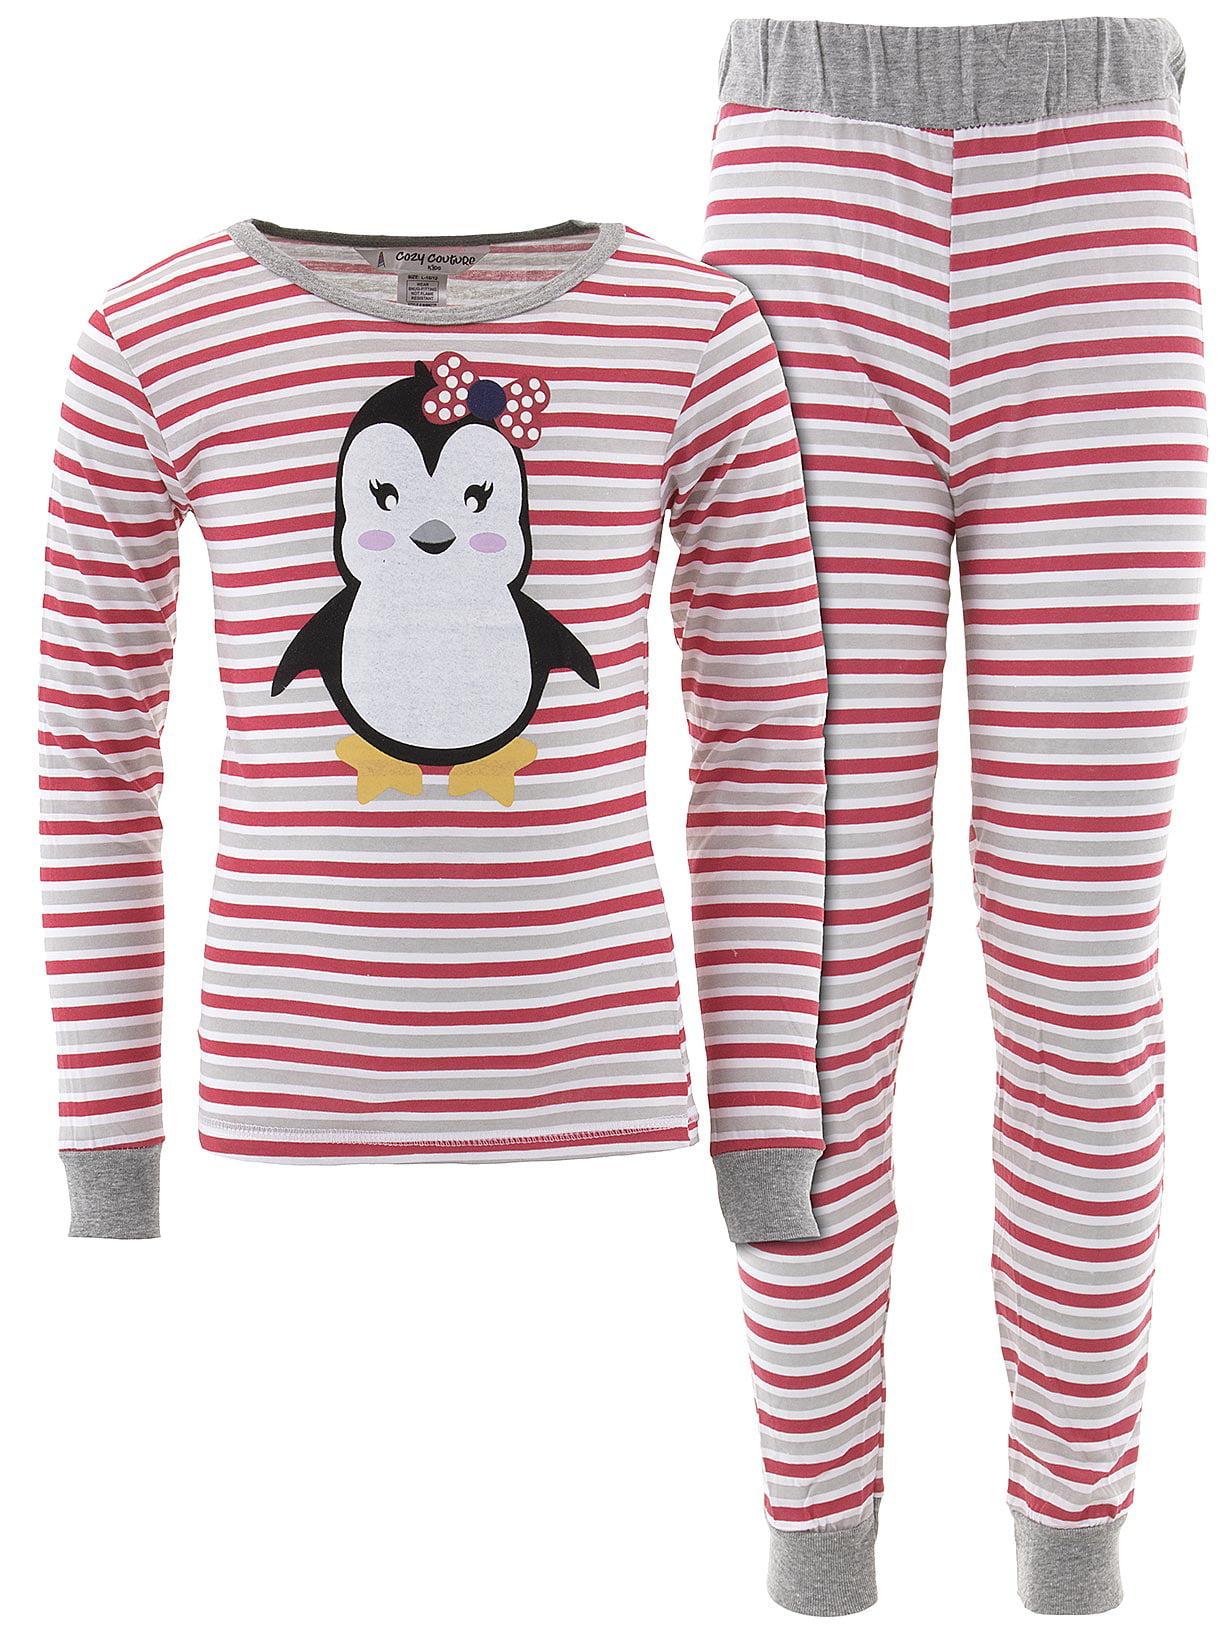 Cozy Couture Girls Penguin Striped Cotton Pajamas